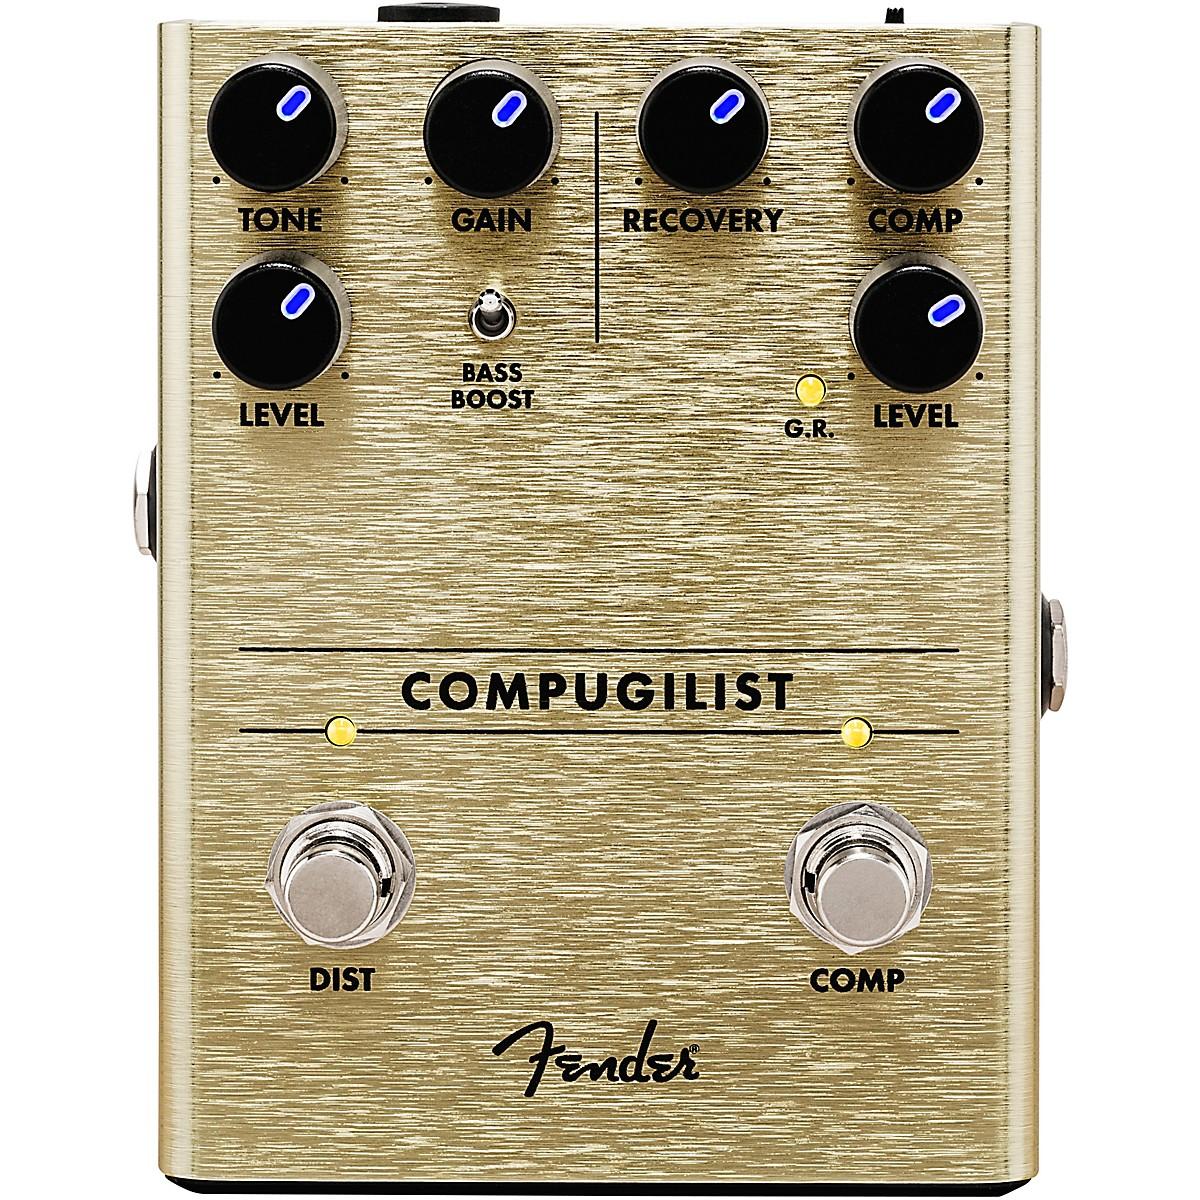 Fender Compugilist Compressor/Distortion Effects Pedal